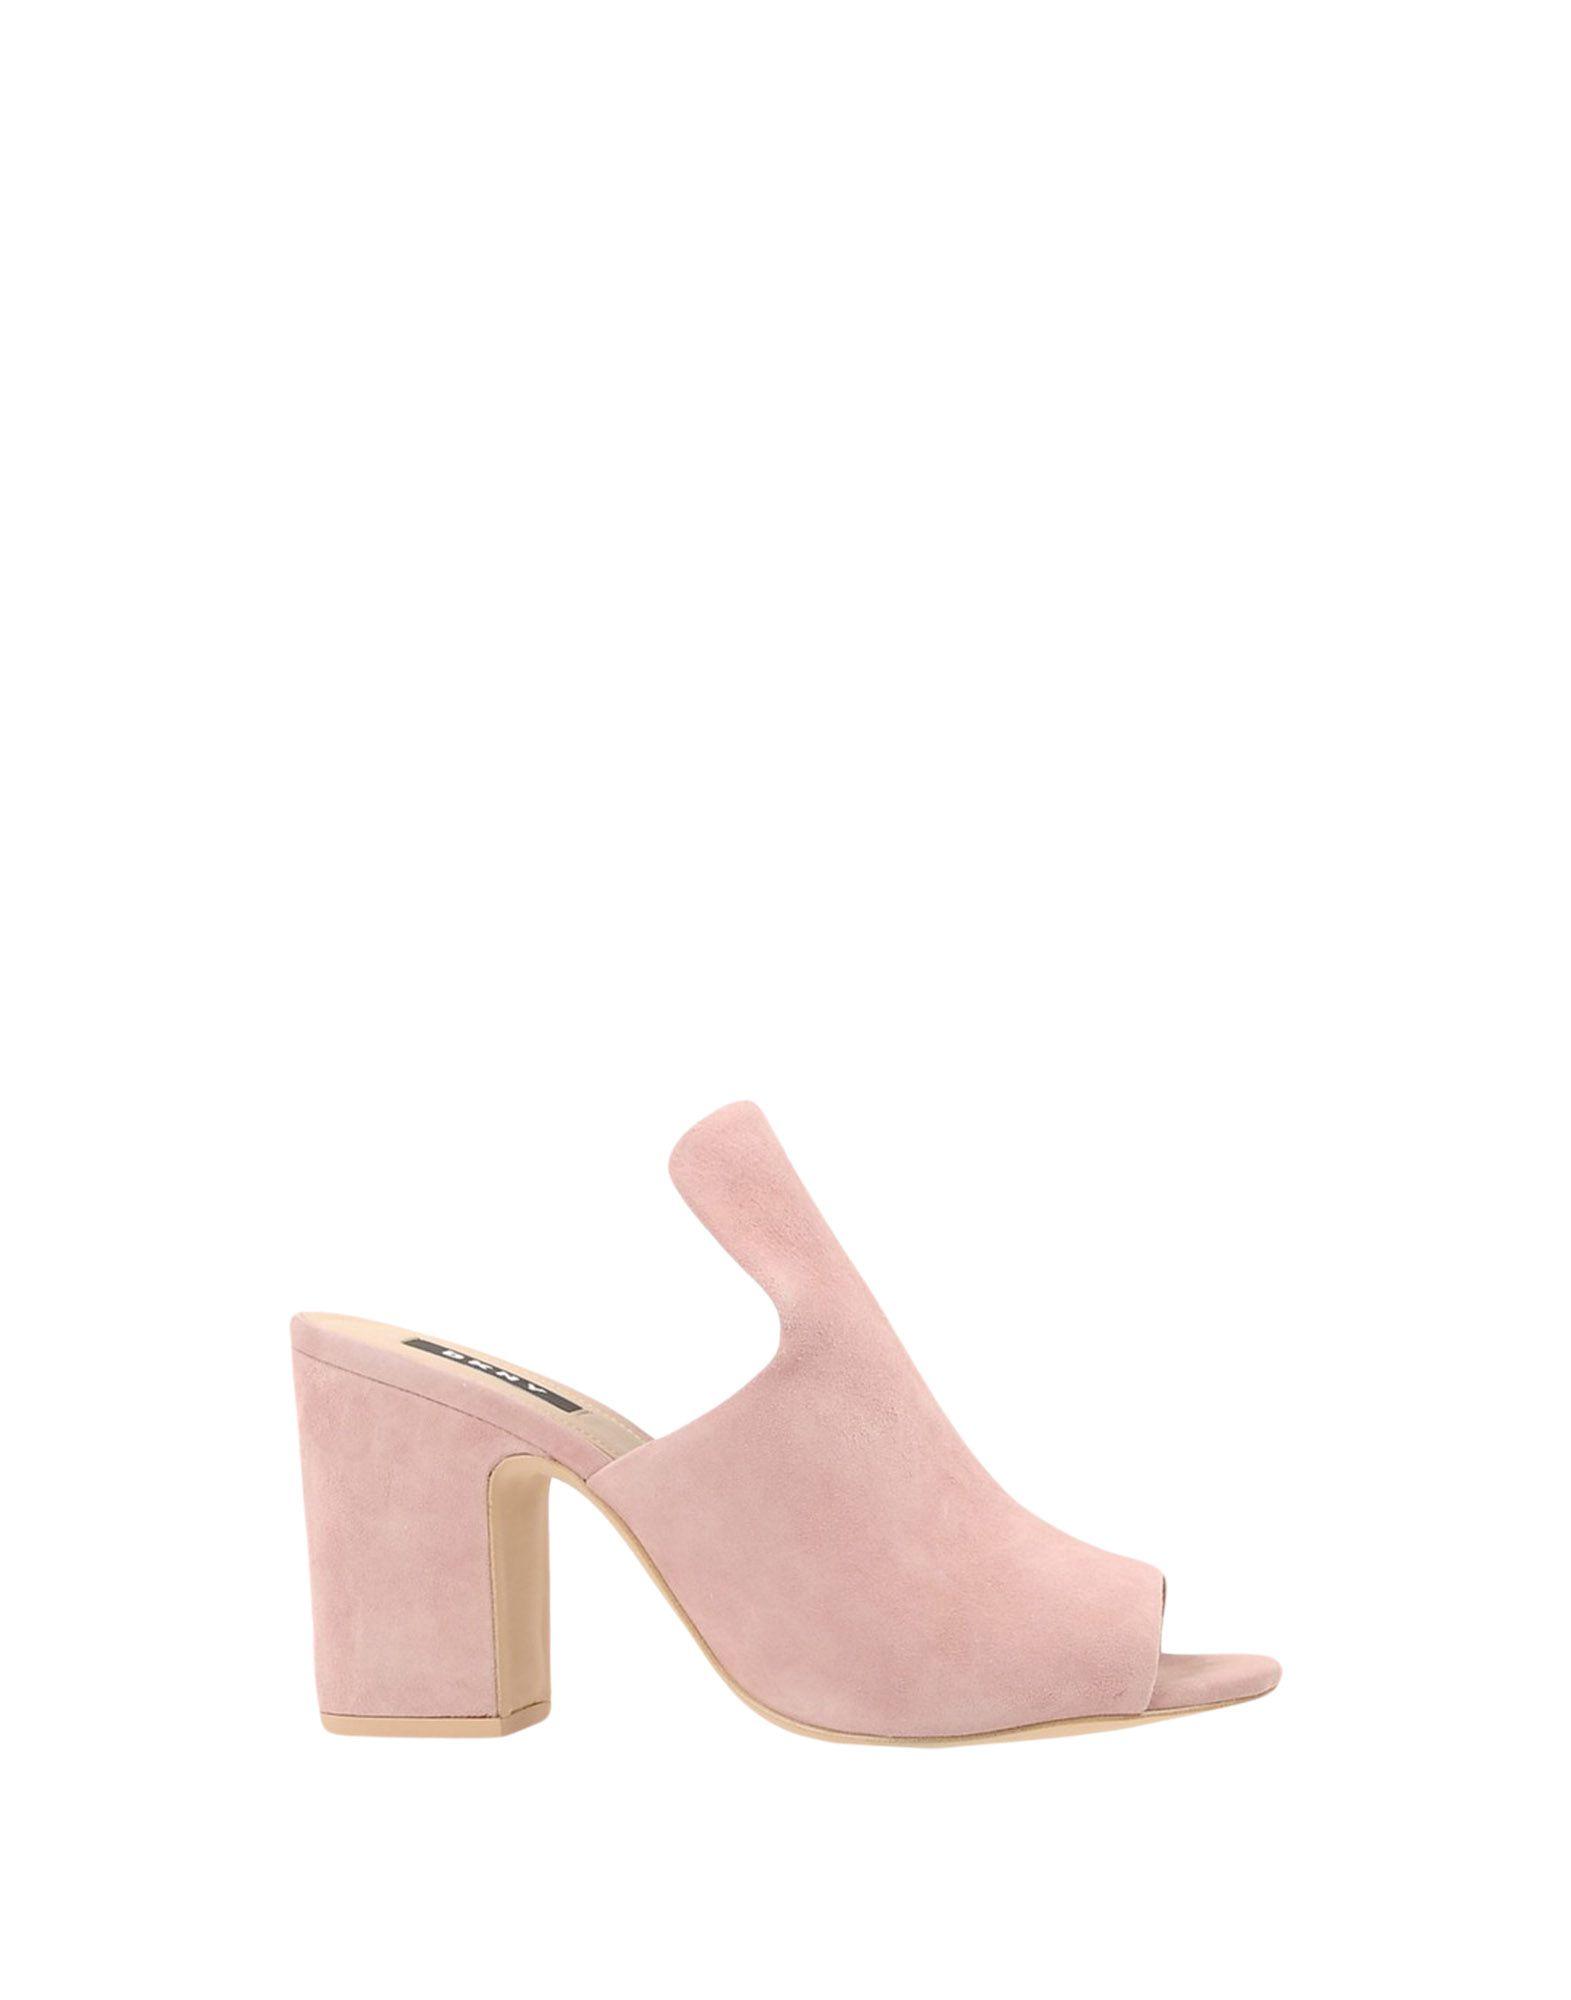 Dkny Womens strapazierfähige Sandals  11414221ACGut aussehende strapazierfähige Womens Schuhe 90fbe1